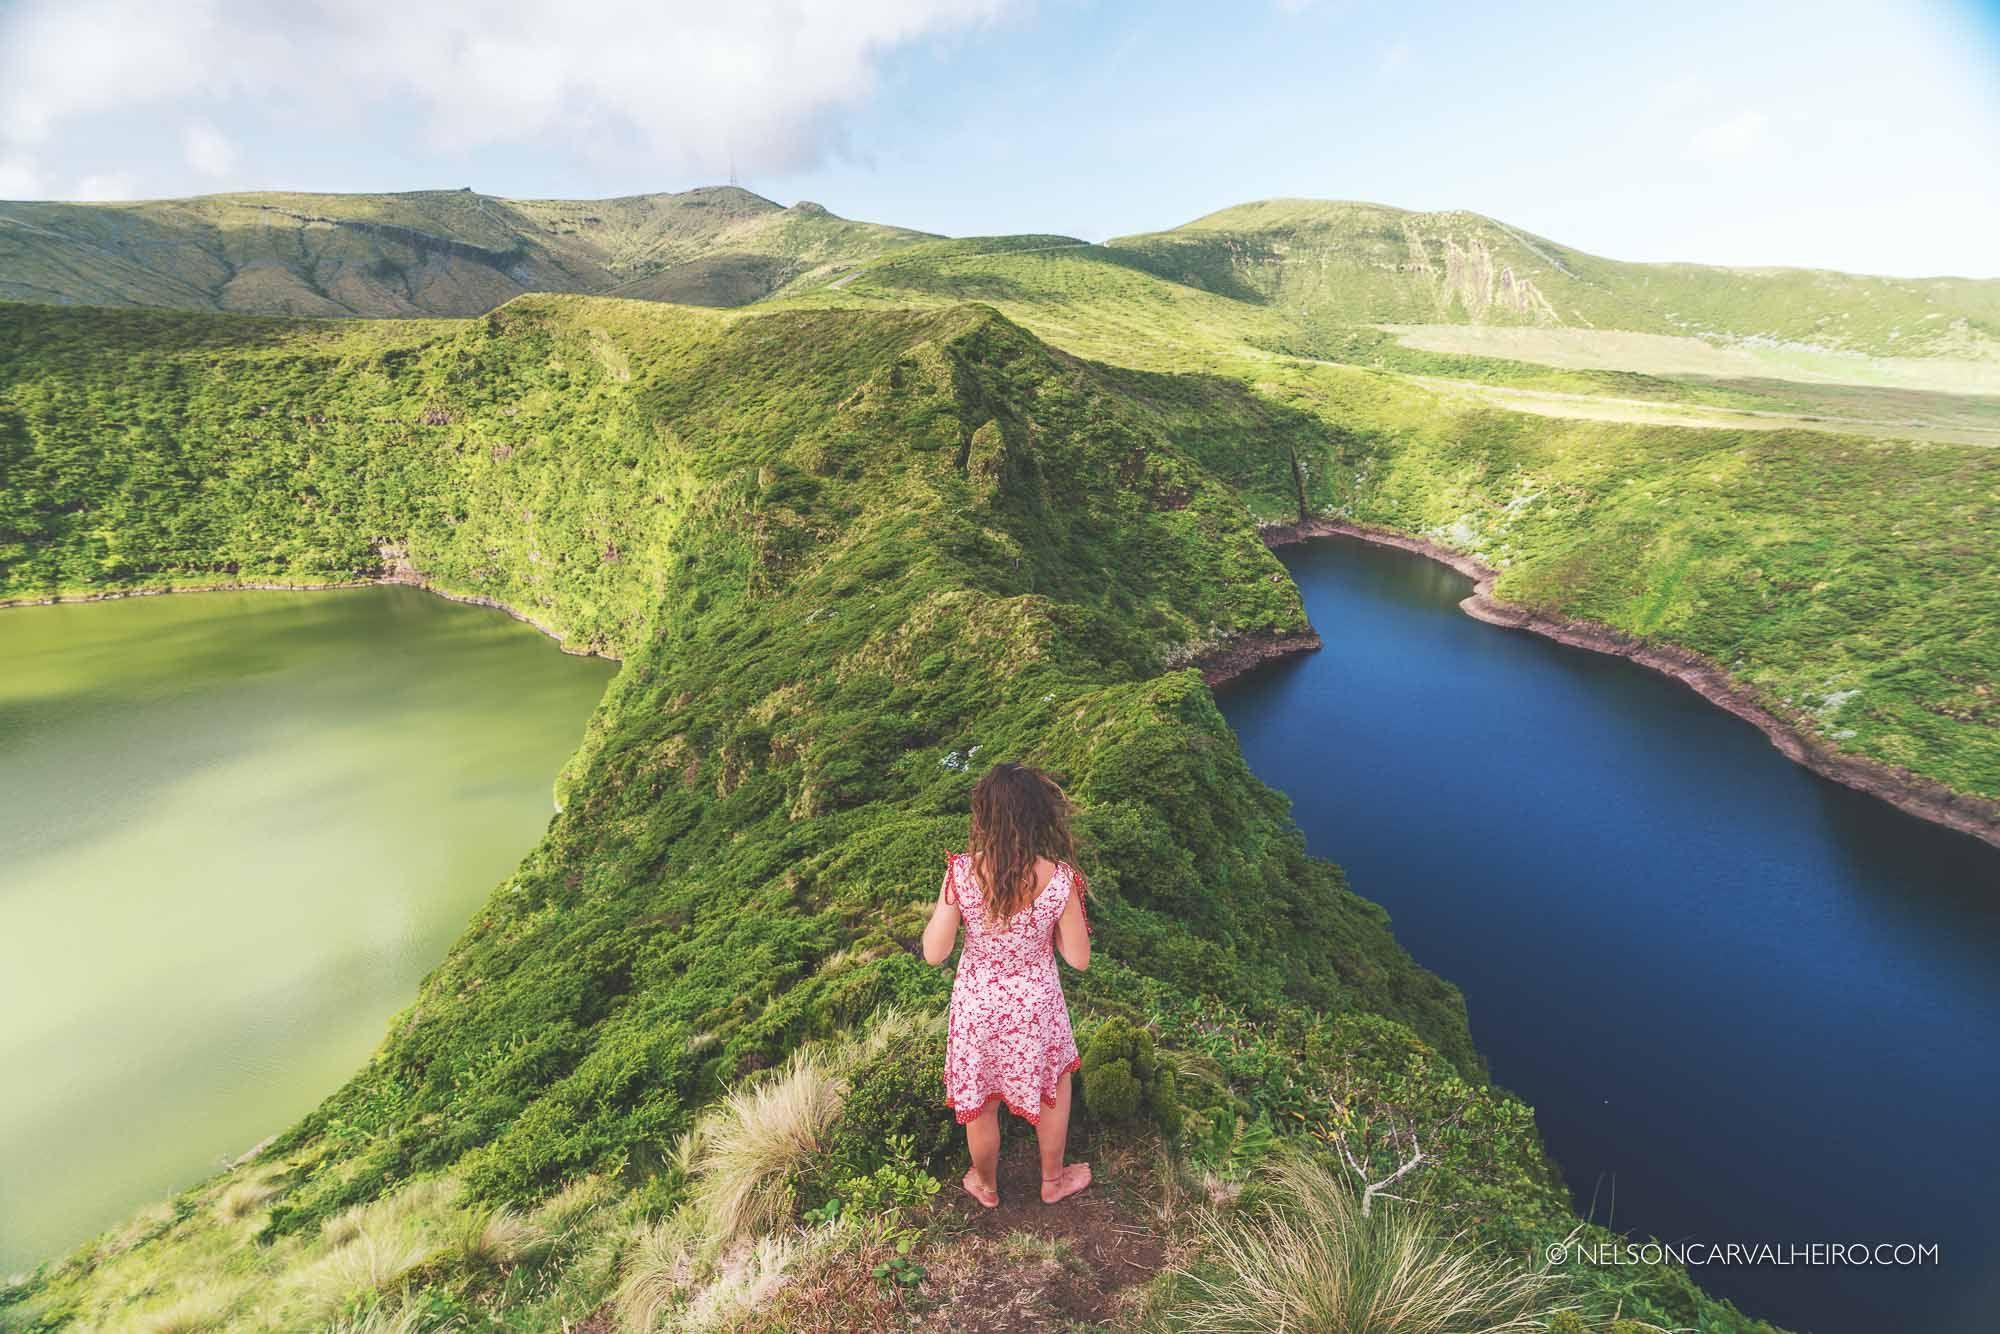 FLORES ISLAND / AZORES / PORTUGAL - Nelson Carvalheiro | Azores, Beautiful  places, Island